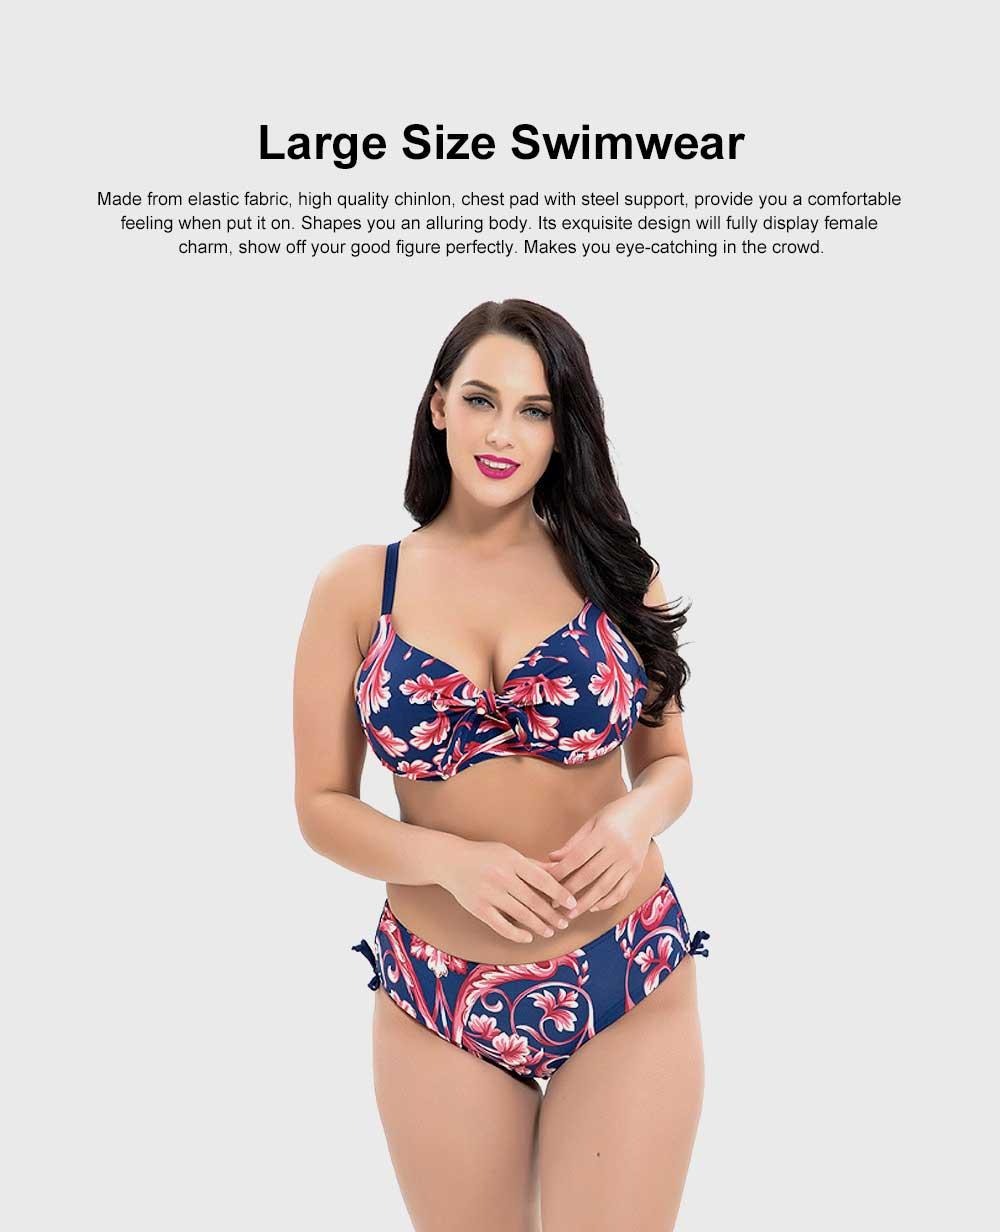 Women's Large Size Sexy Swimming Suits, Two-Piece Plus Size Beachwear, Fashion Printing Bathing Suits 4XL 5XL 6XL 7XL 8XL 0